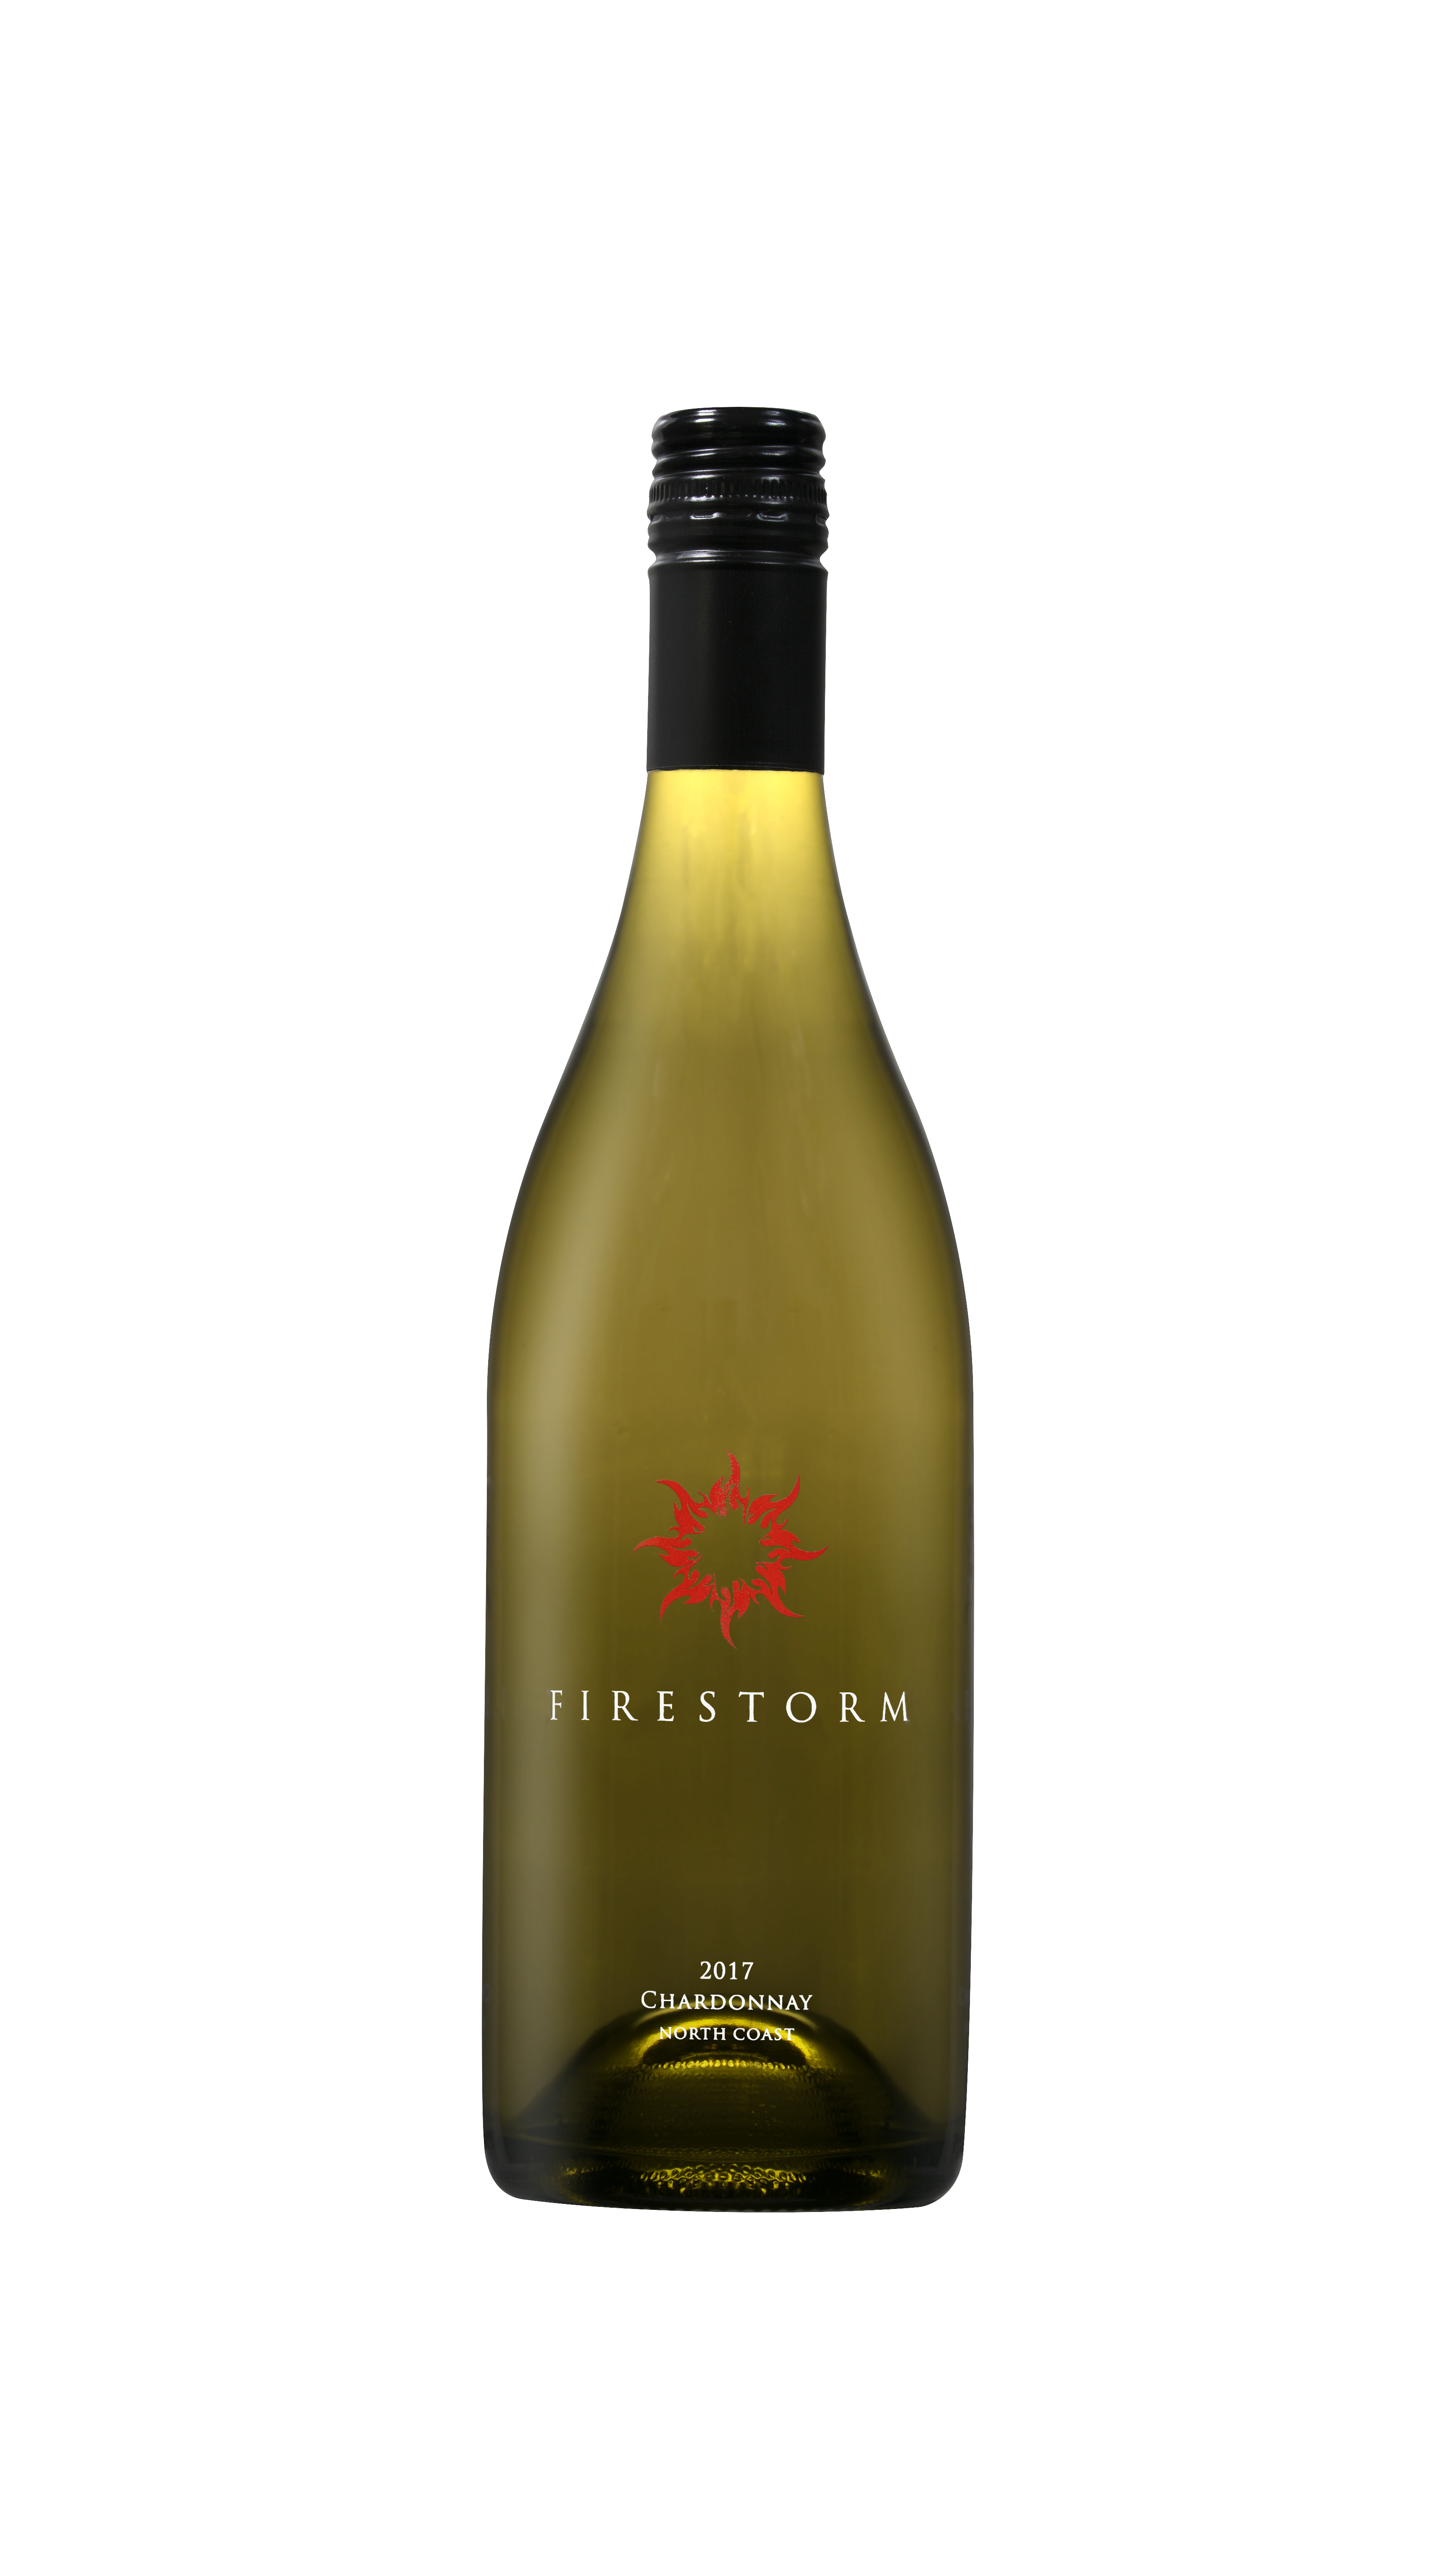 2017 Firestorm North Coast Chardonnay 00002